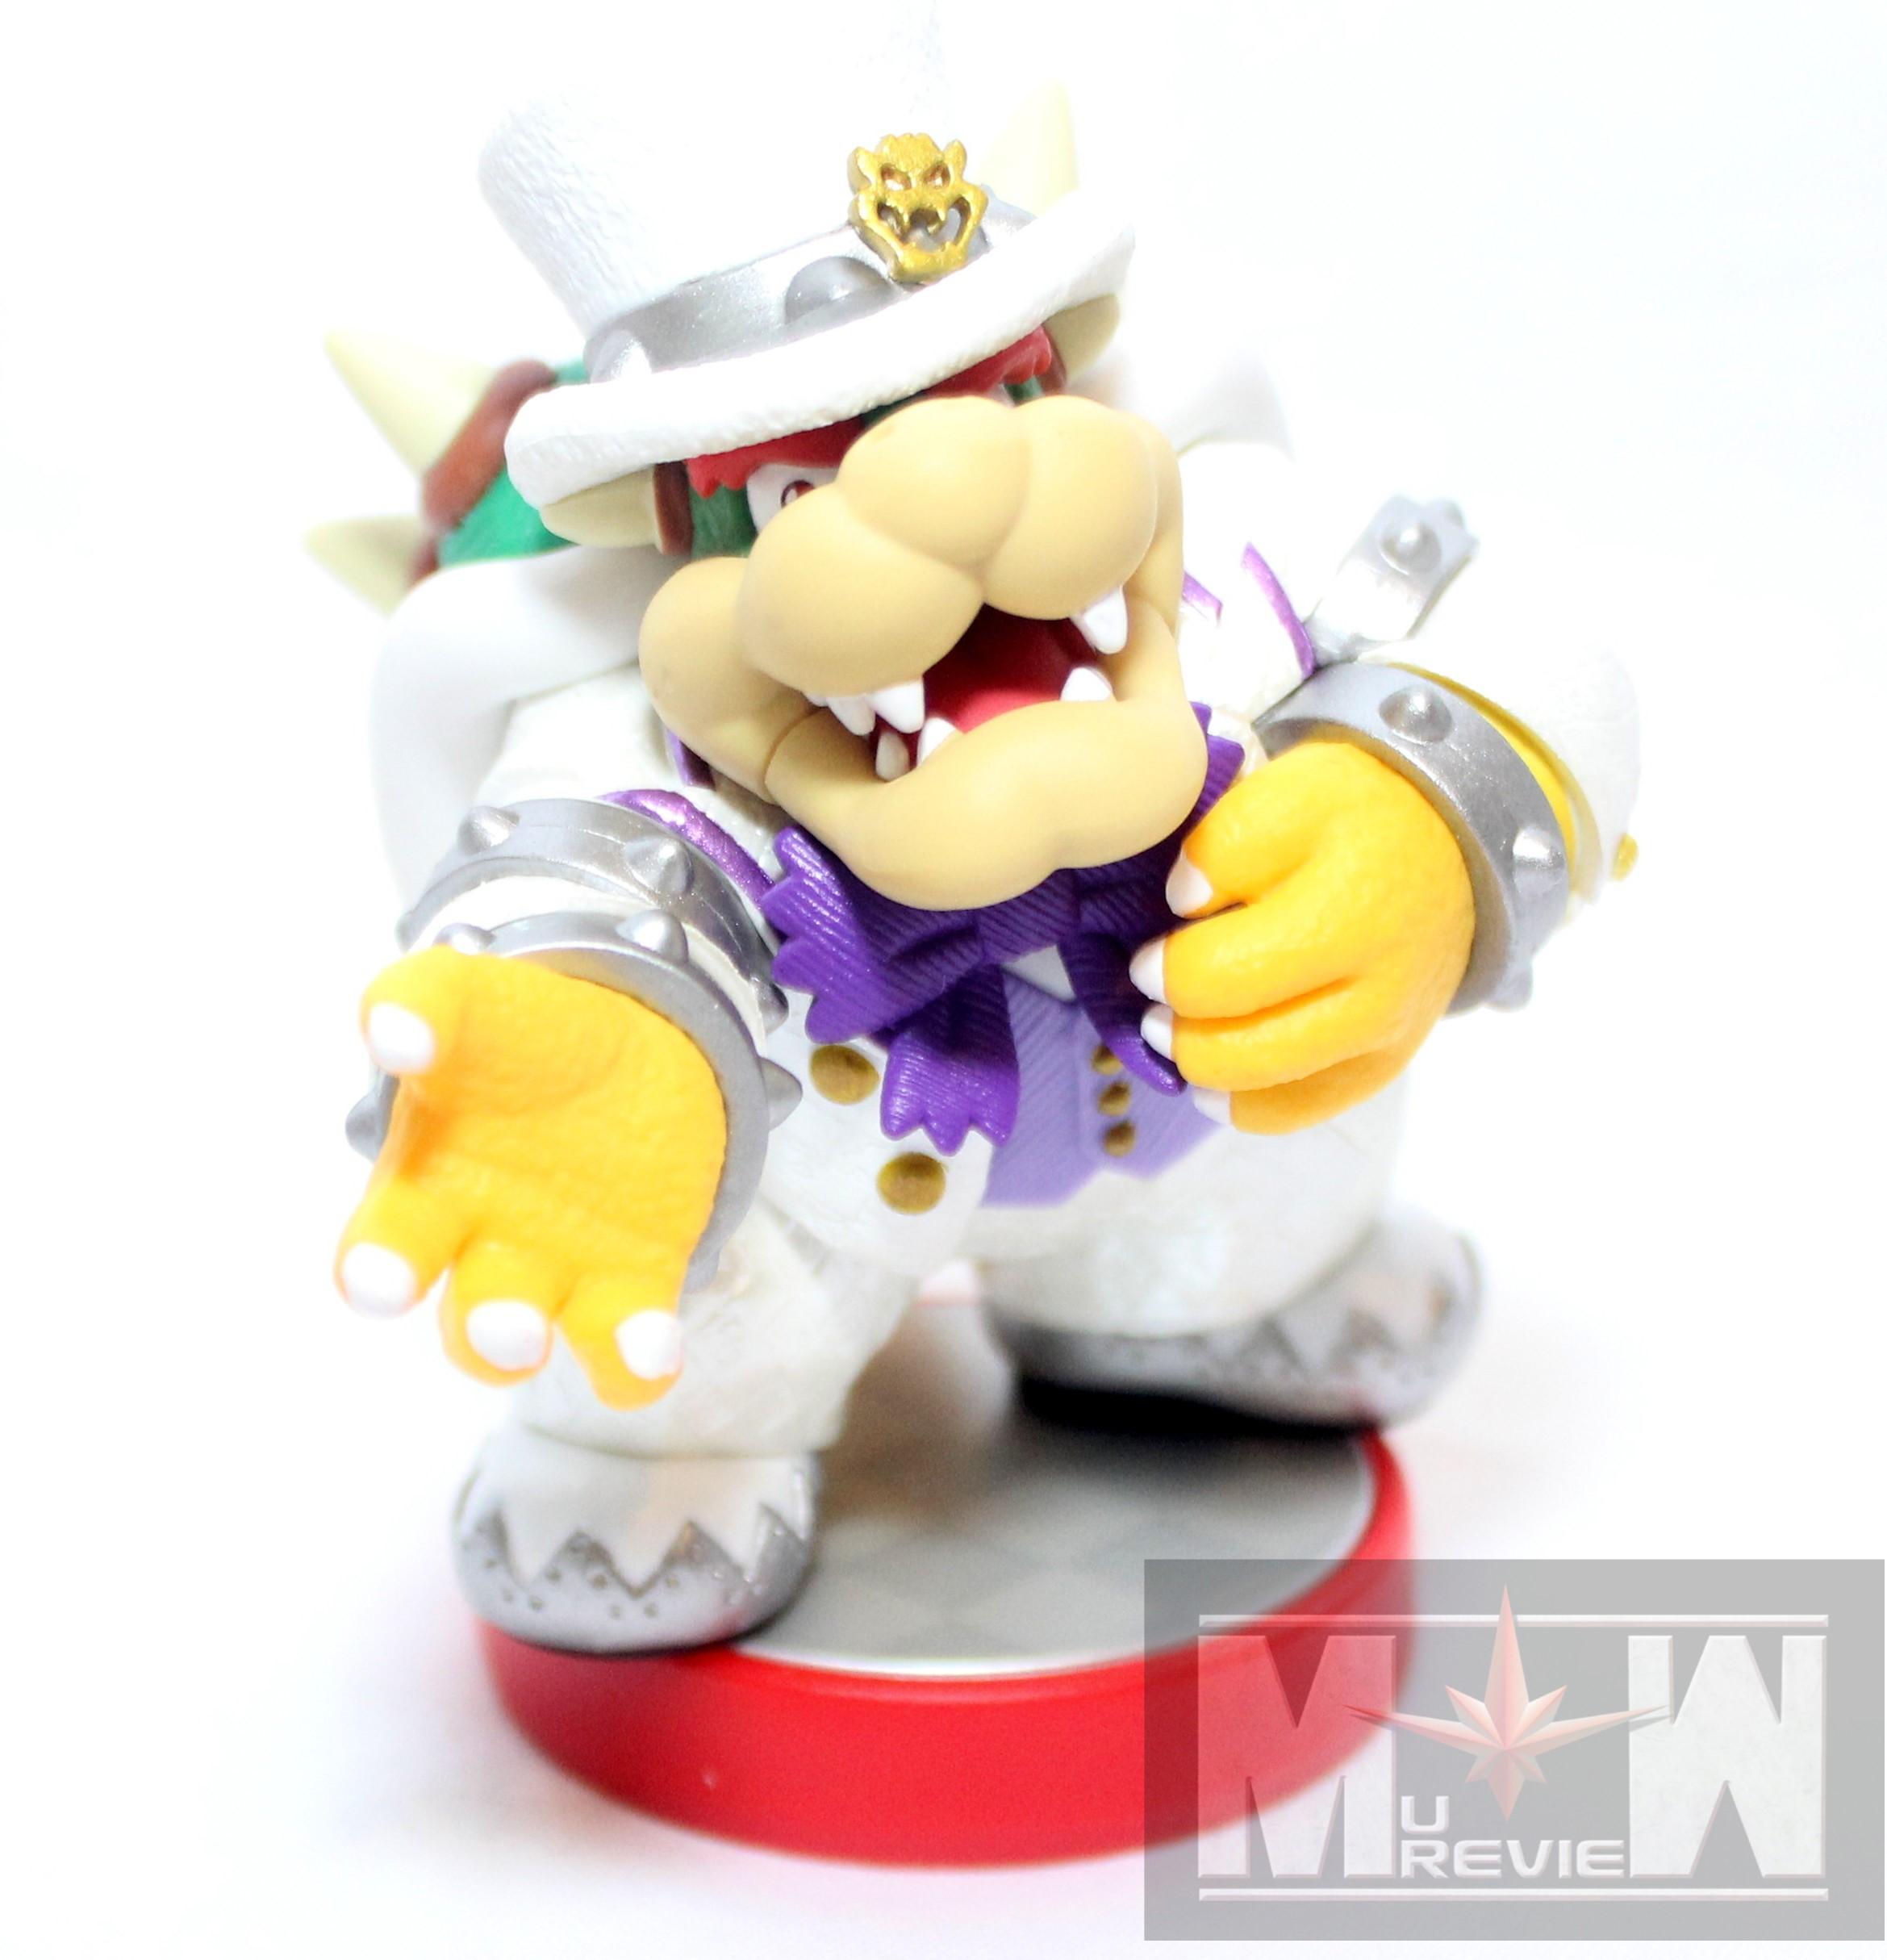 Super Mario Odyssey | MUReview